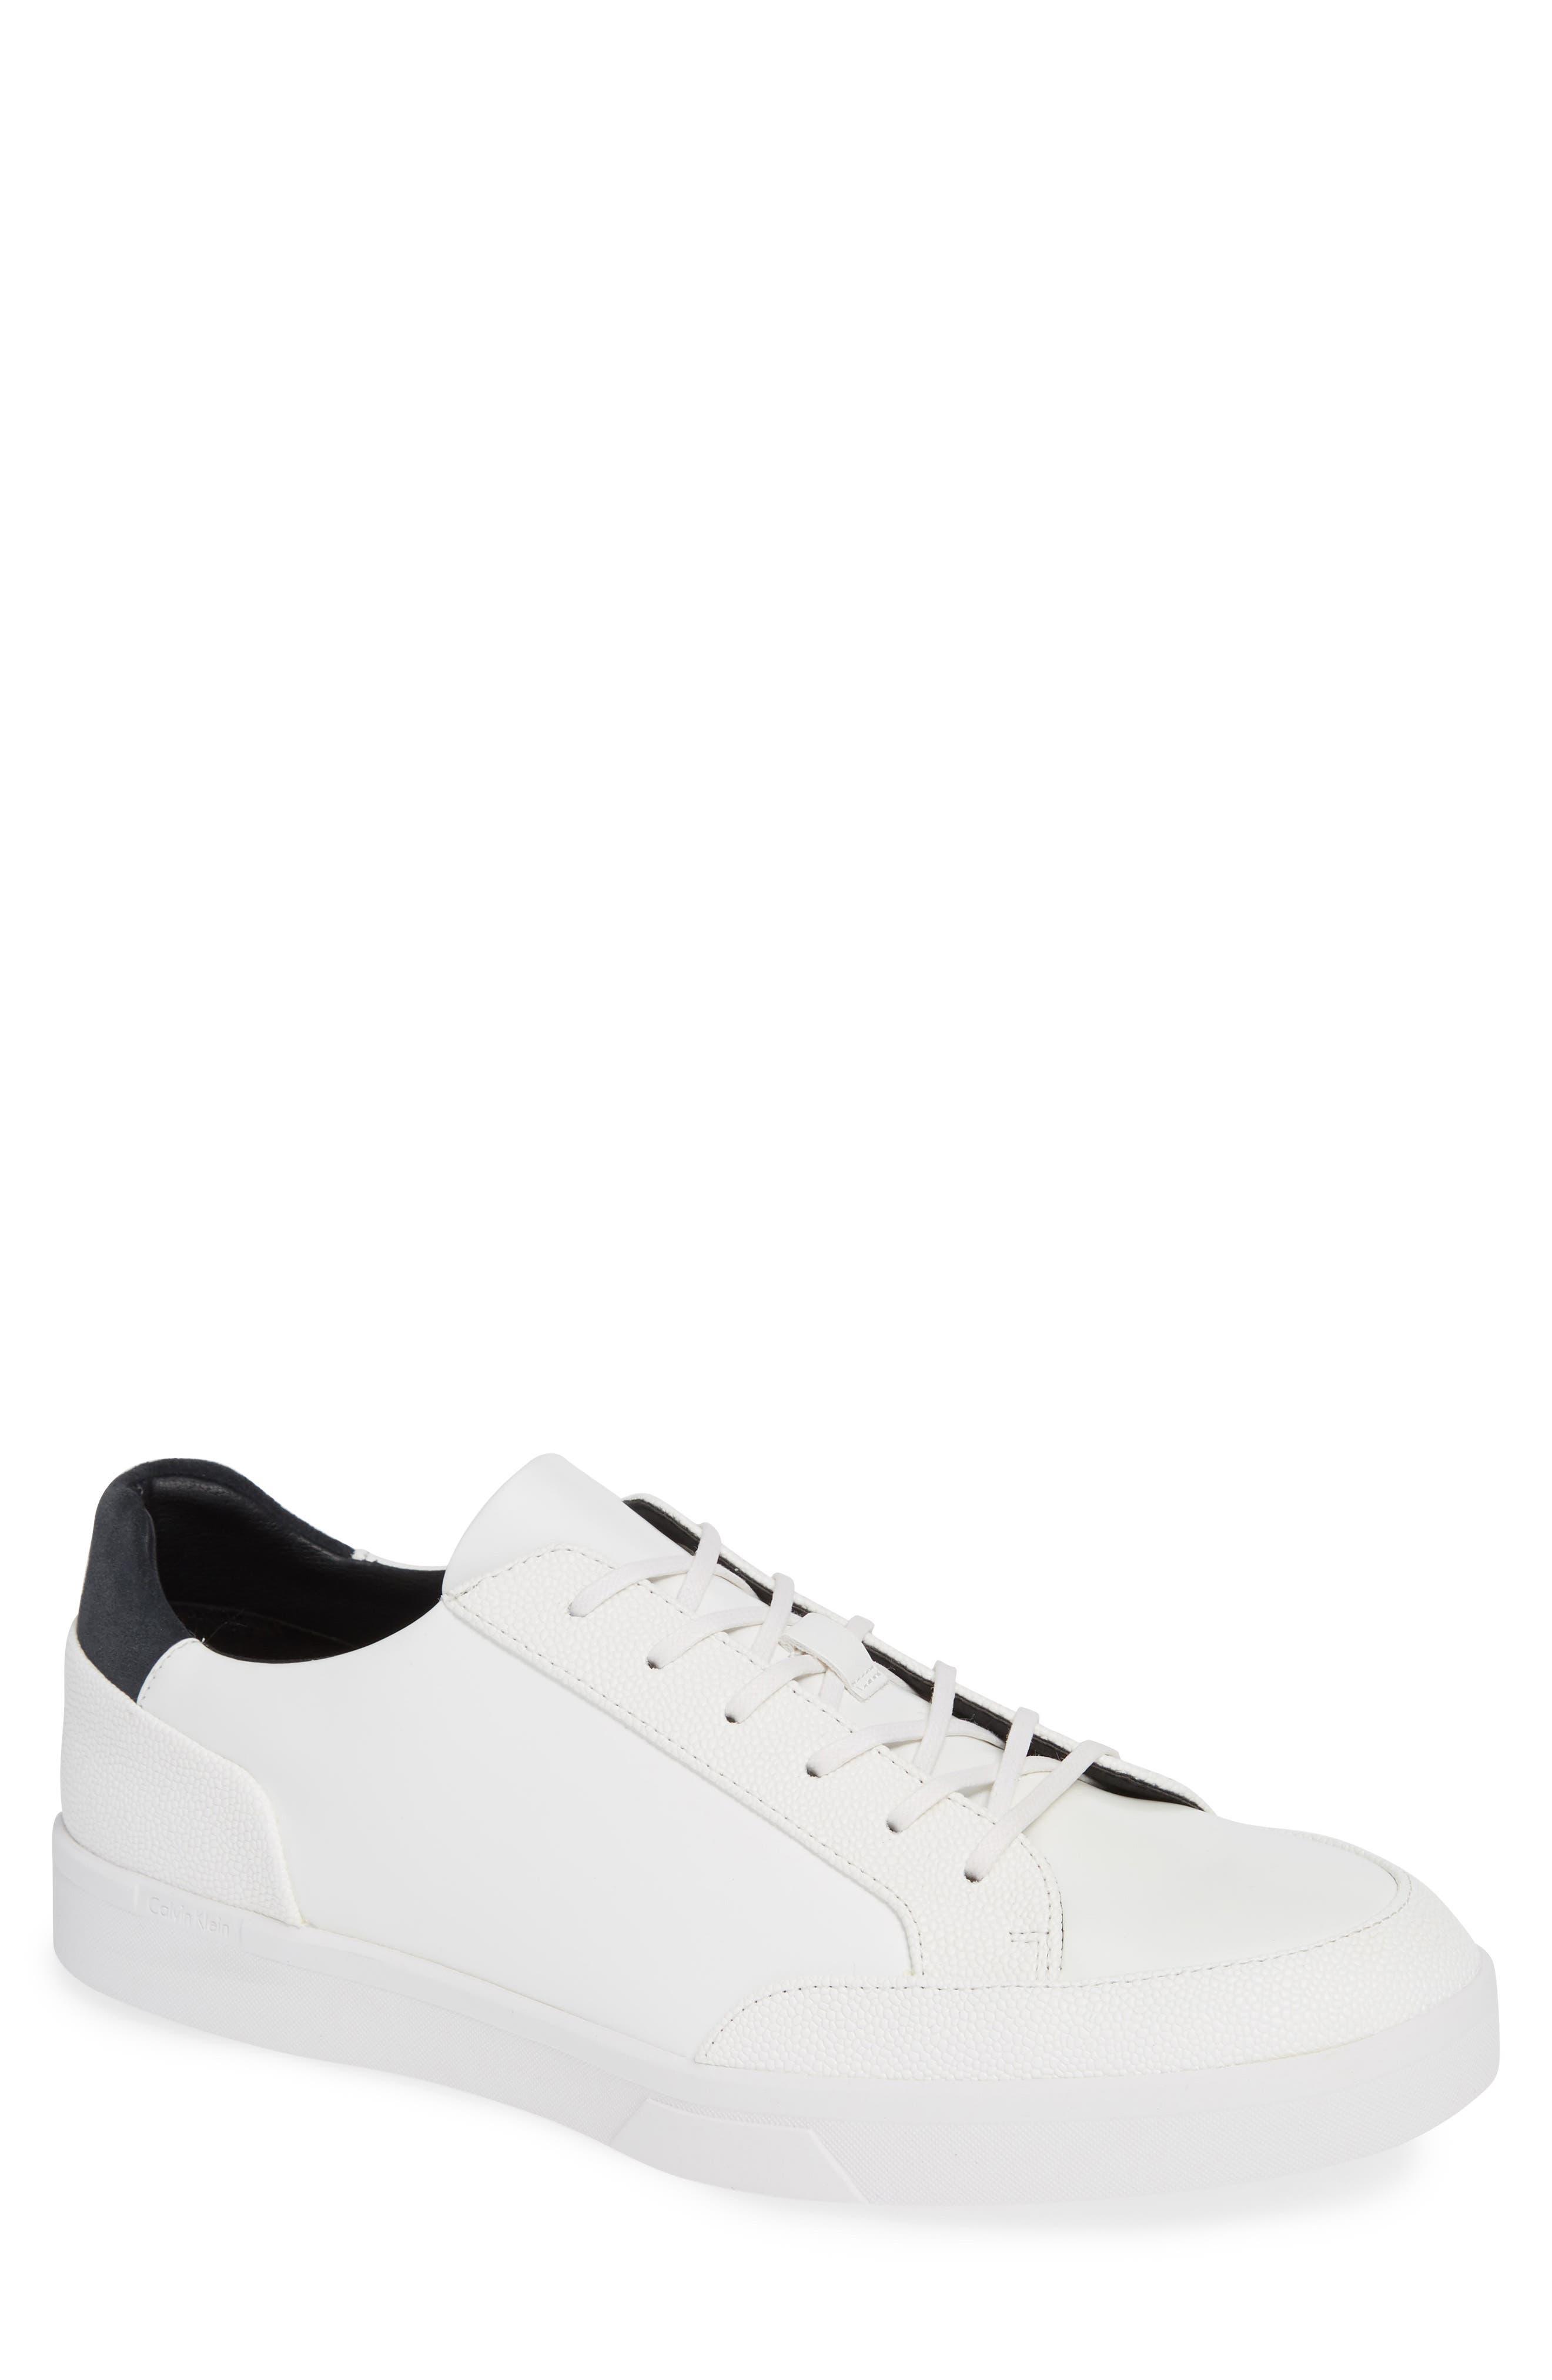 Izar Sneaker,                             Main thumbnail 1, color,                             WHITE LEATHER